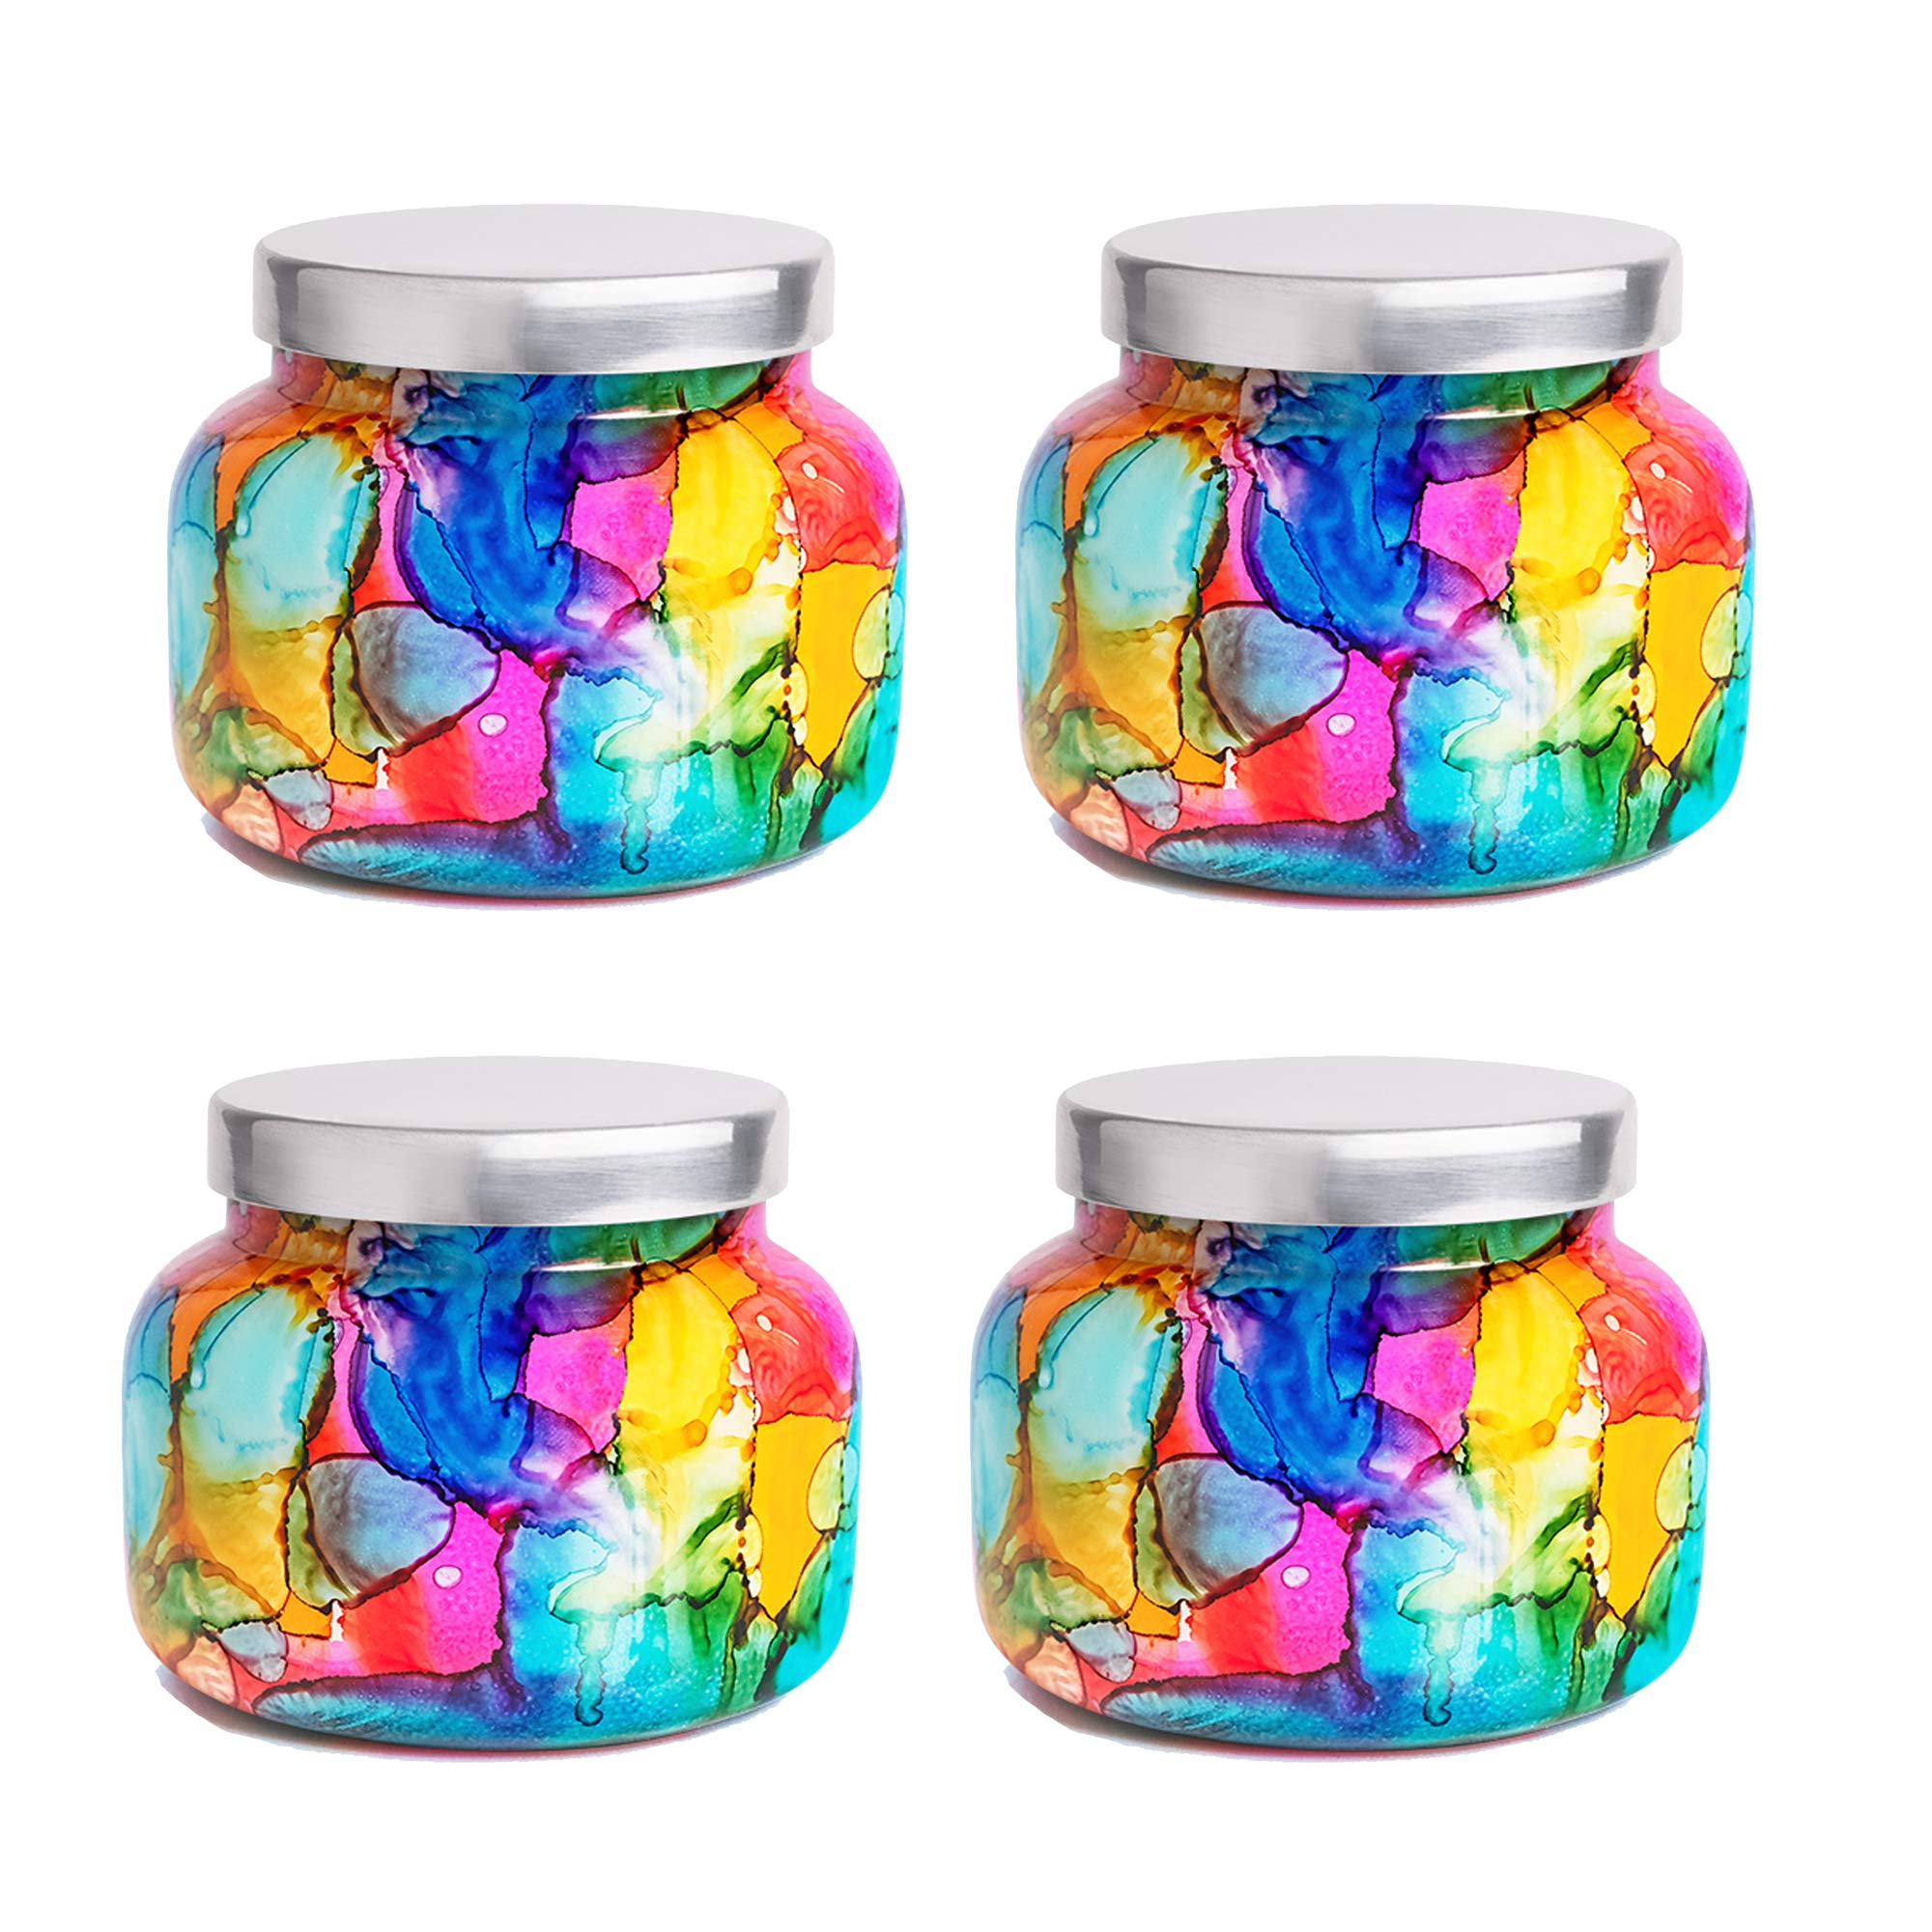 Capri Blue 19 oz Rainbow Signature Jar Volcano Candle (4 Pack), Assorted, One Size